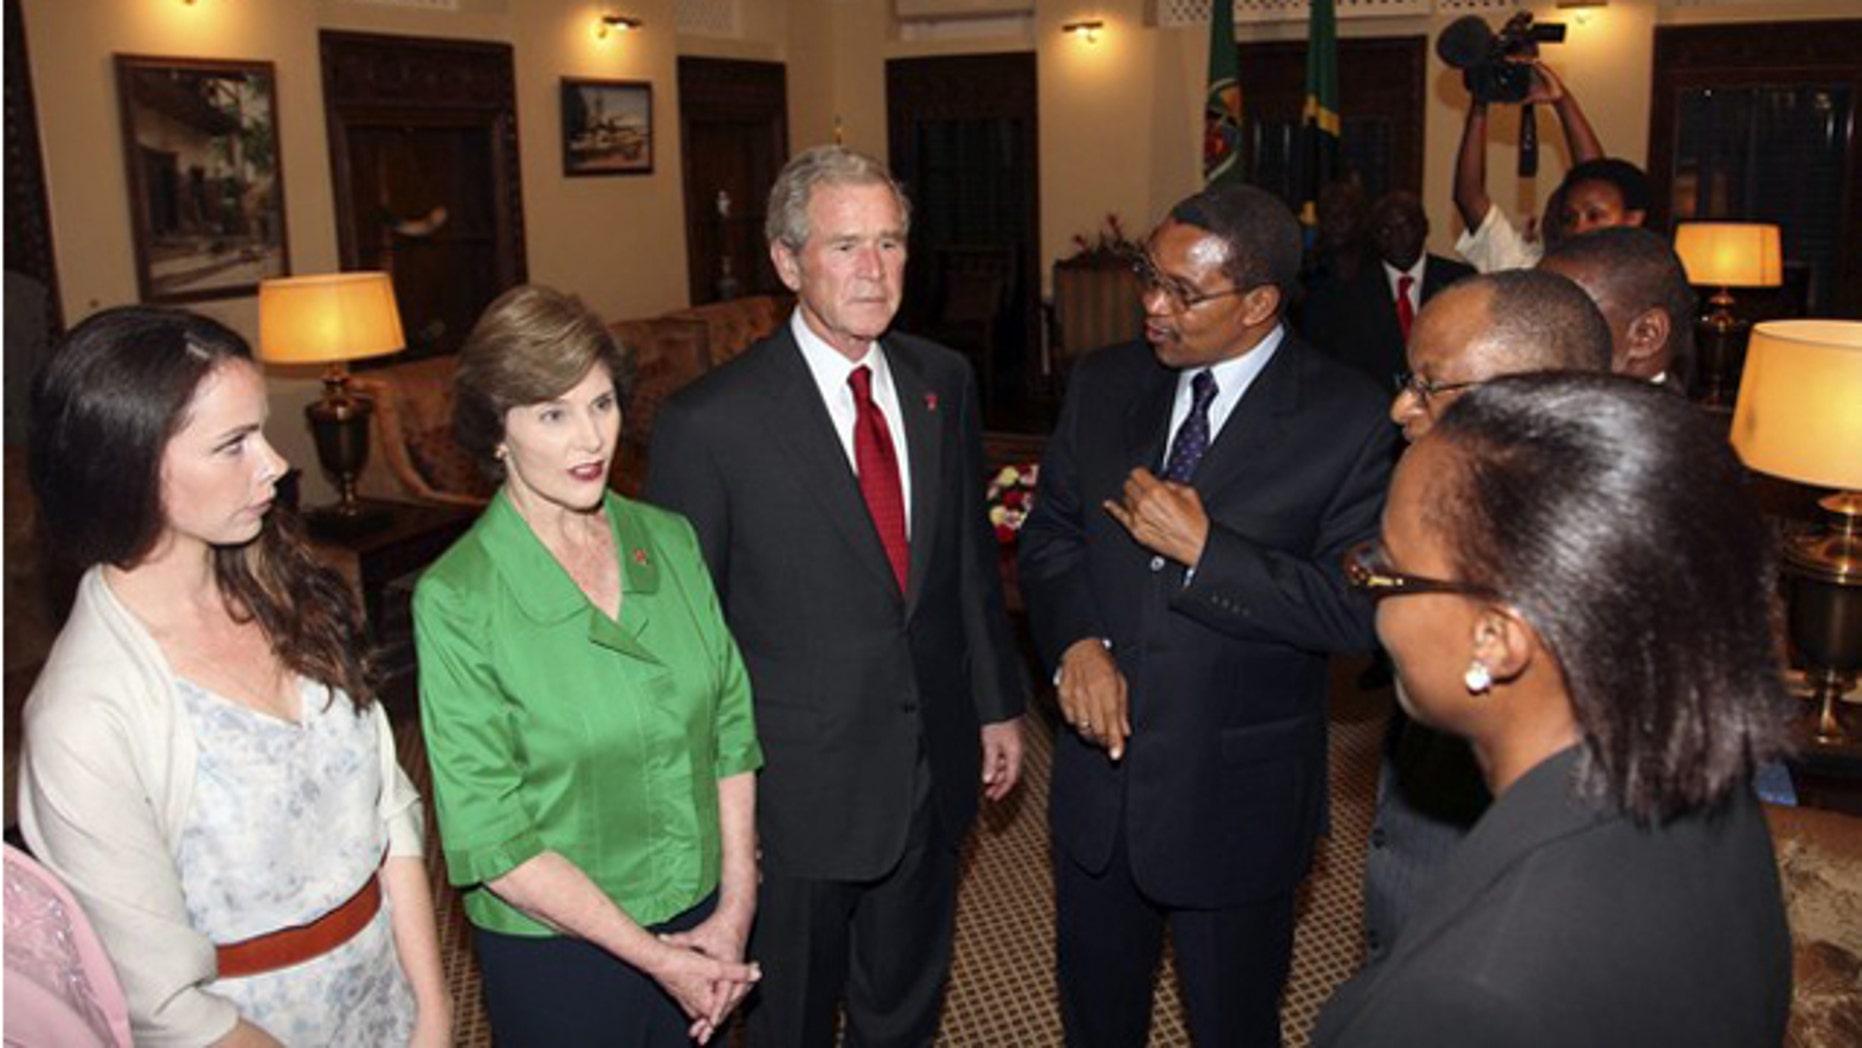 Dec. 1, 2011: Former President George W. Bush speaks with Tanzanian President Jakaya Kikwete upon arriving at the State House in Dar es Salaam.